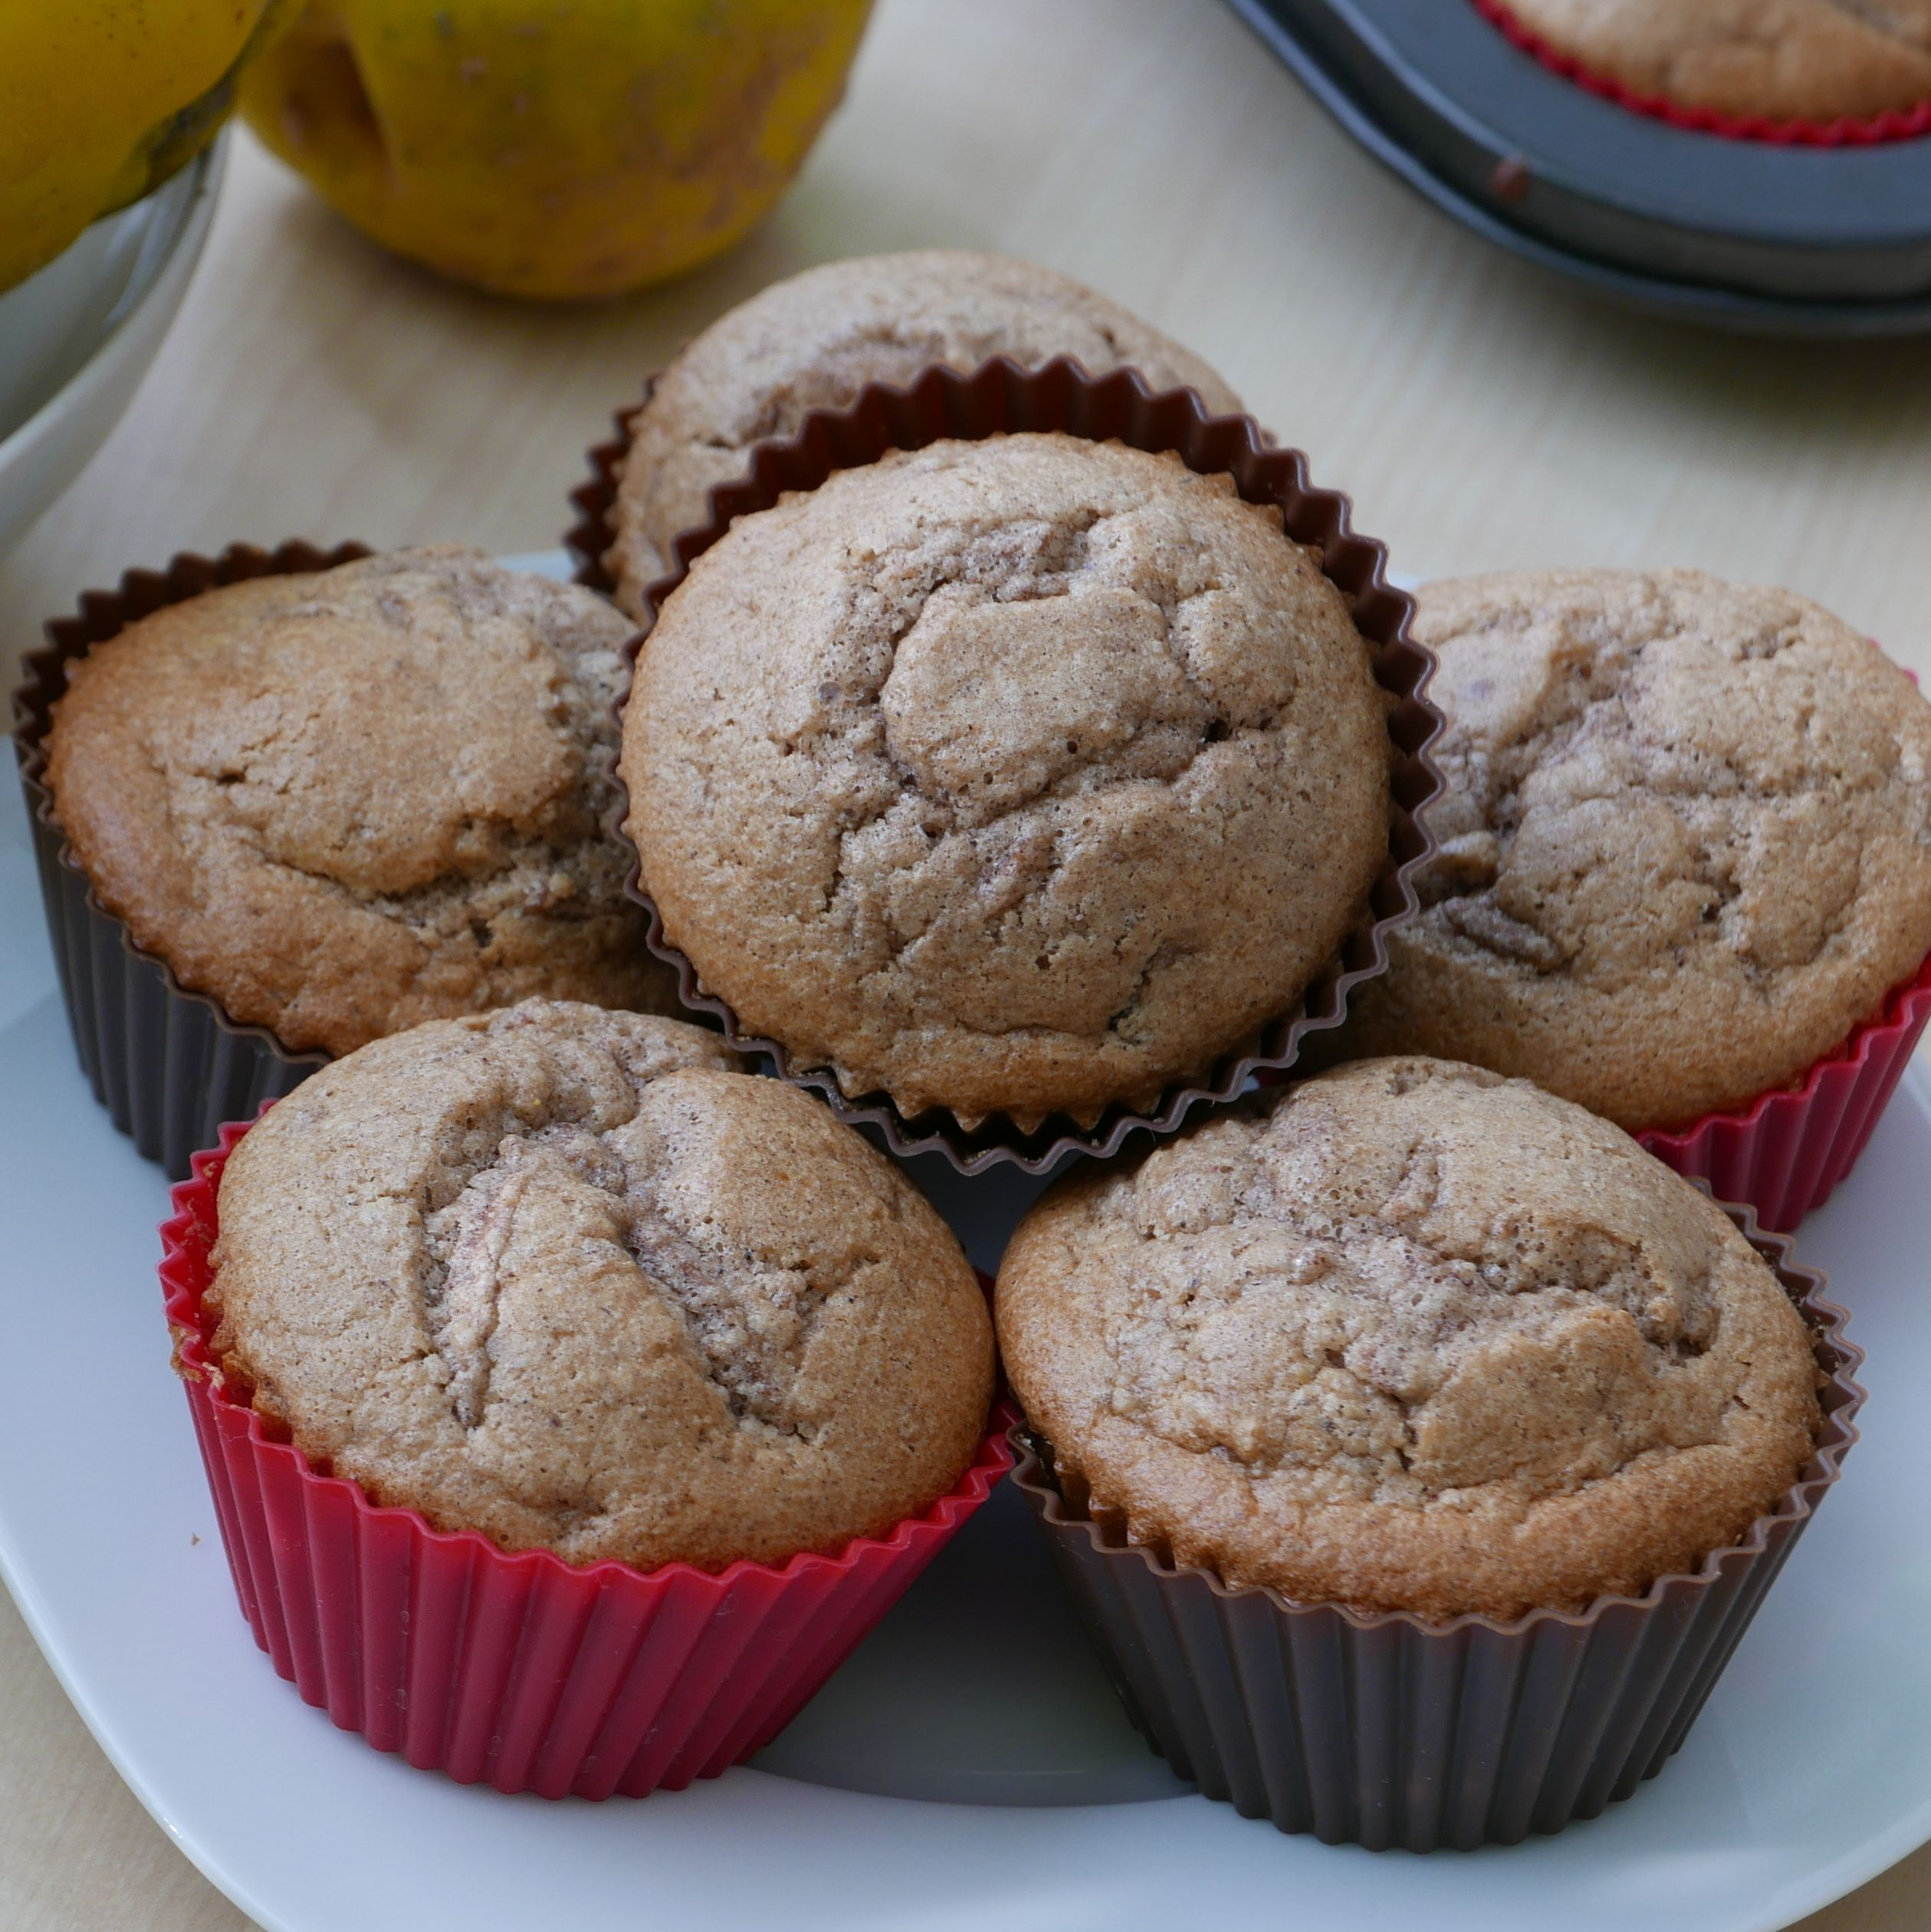 Quince (Apple) Cinnamon Muffins